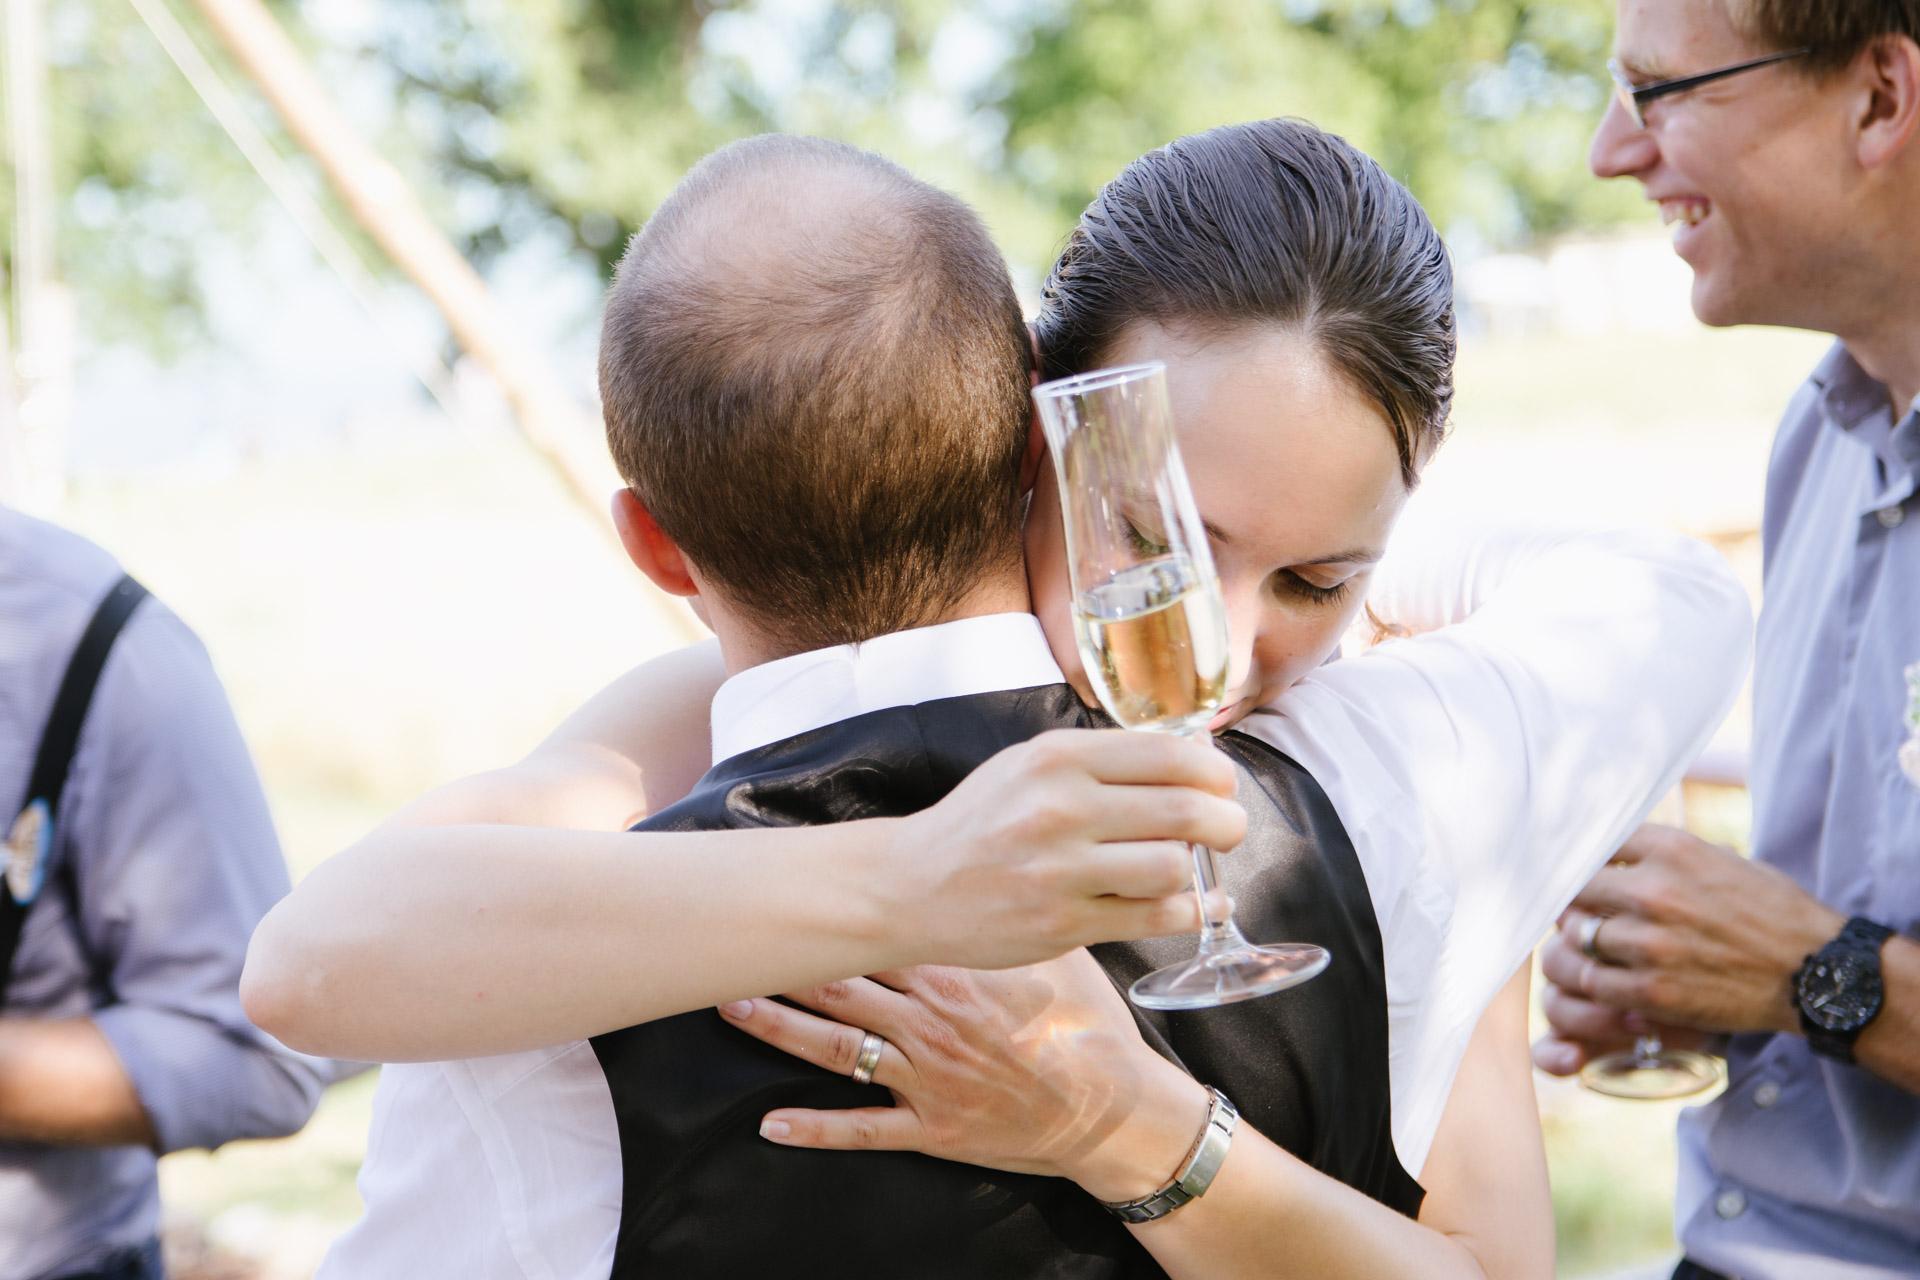 Pixelart_Hochzeitsfotografen_Loerrach_Rheinfelden_Hallwil_Schweiz_Linda-Ramon-1044